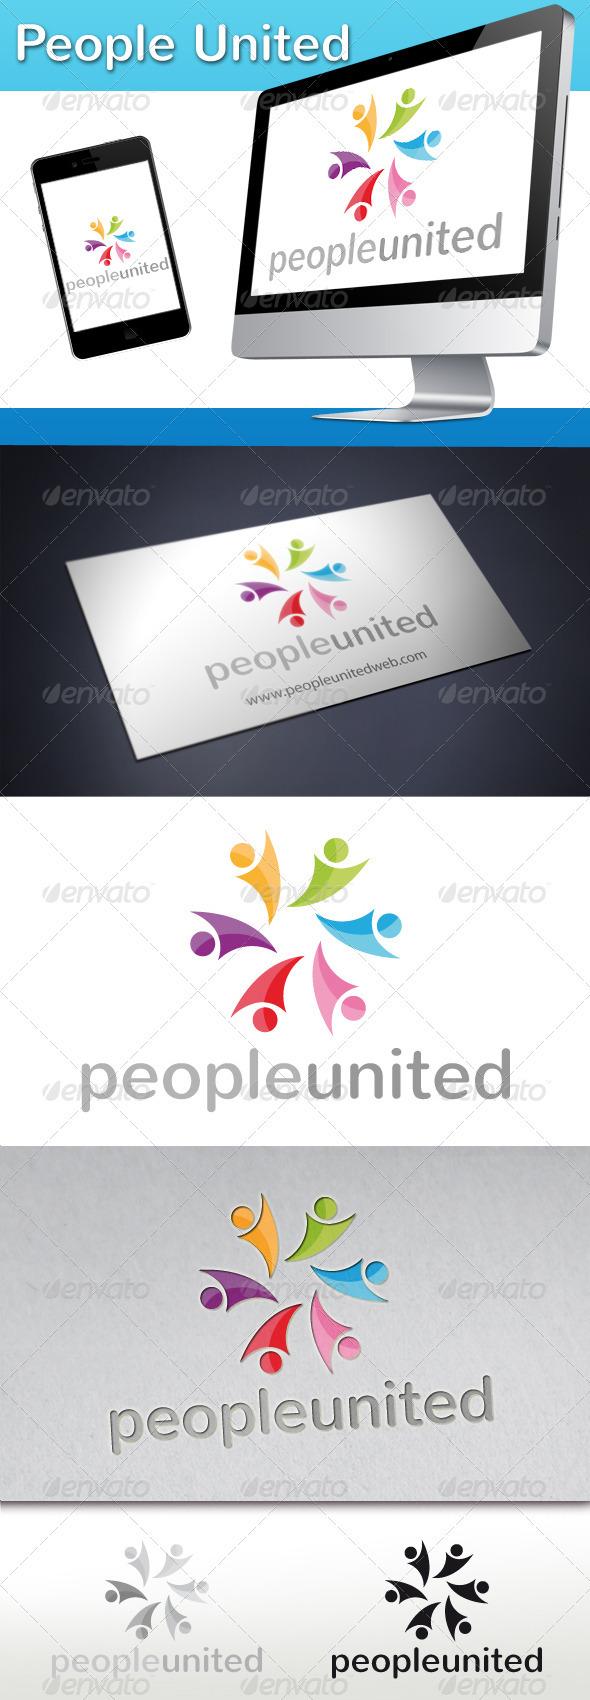 People United Logo